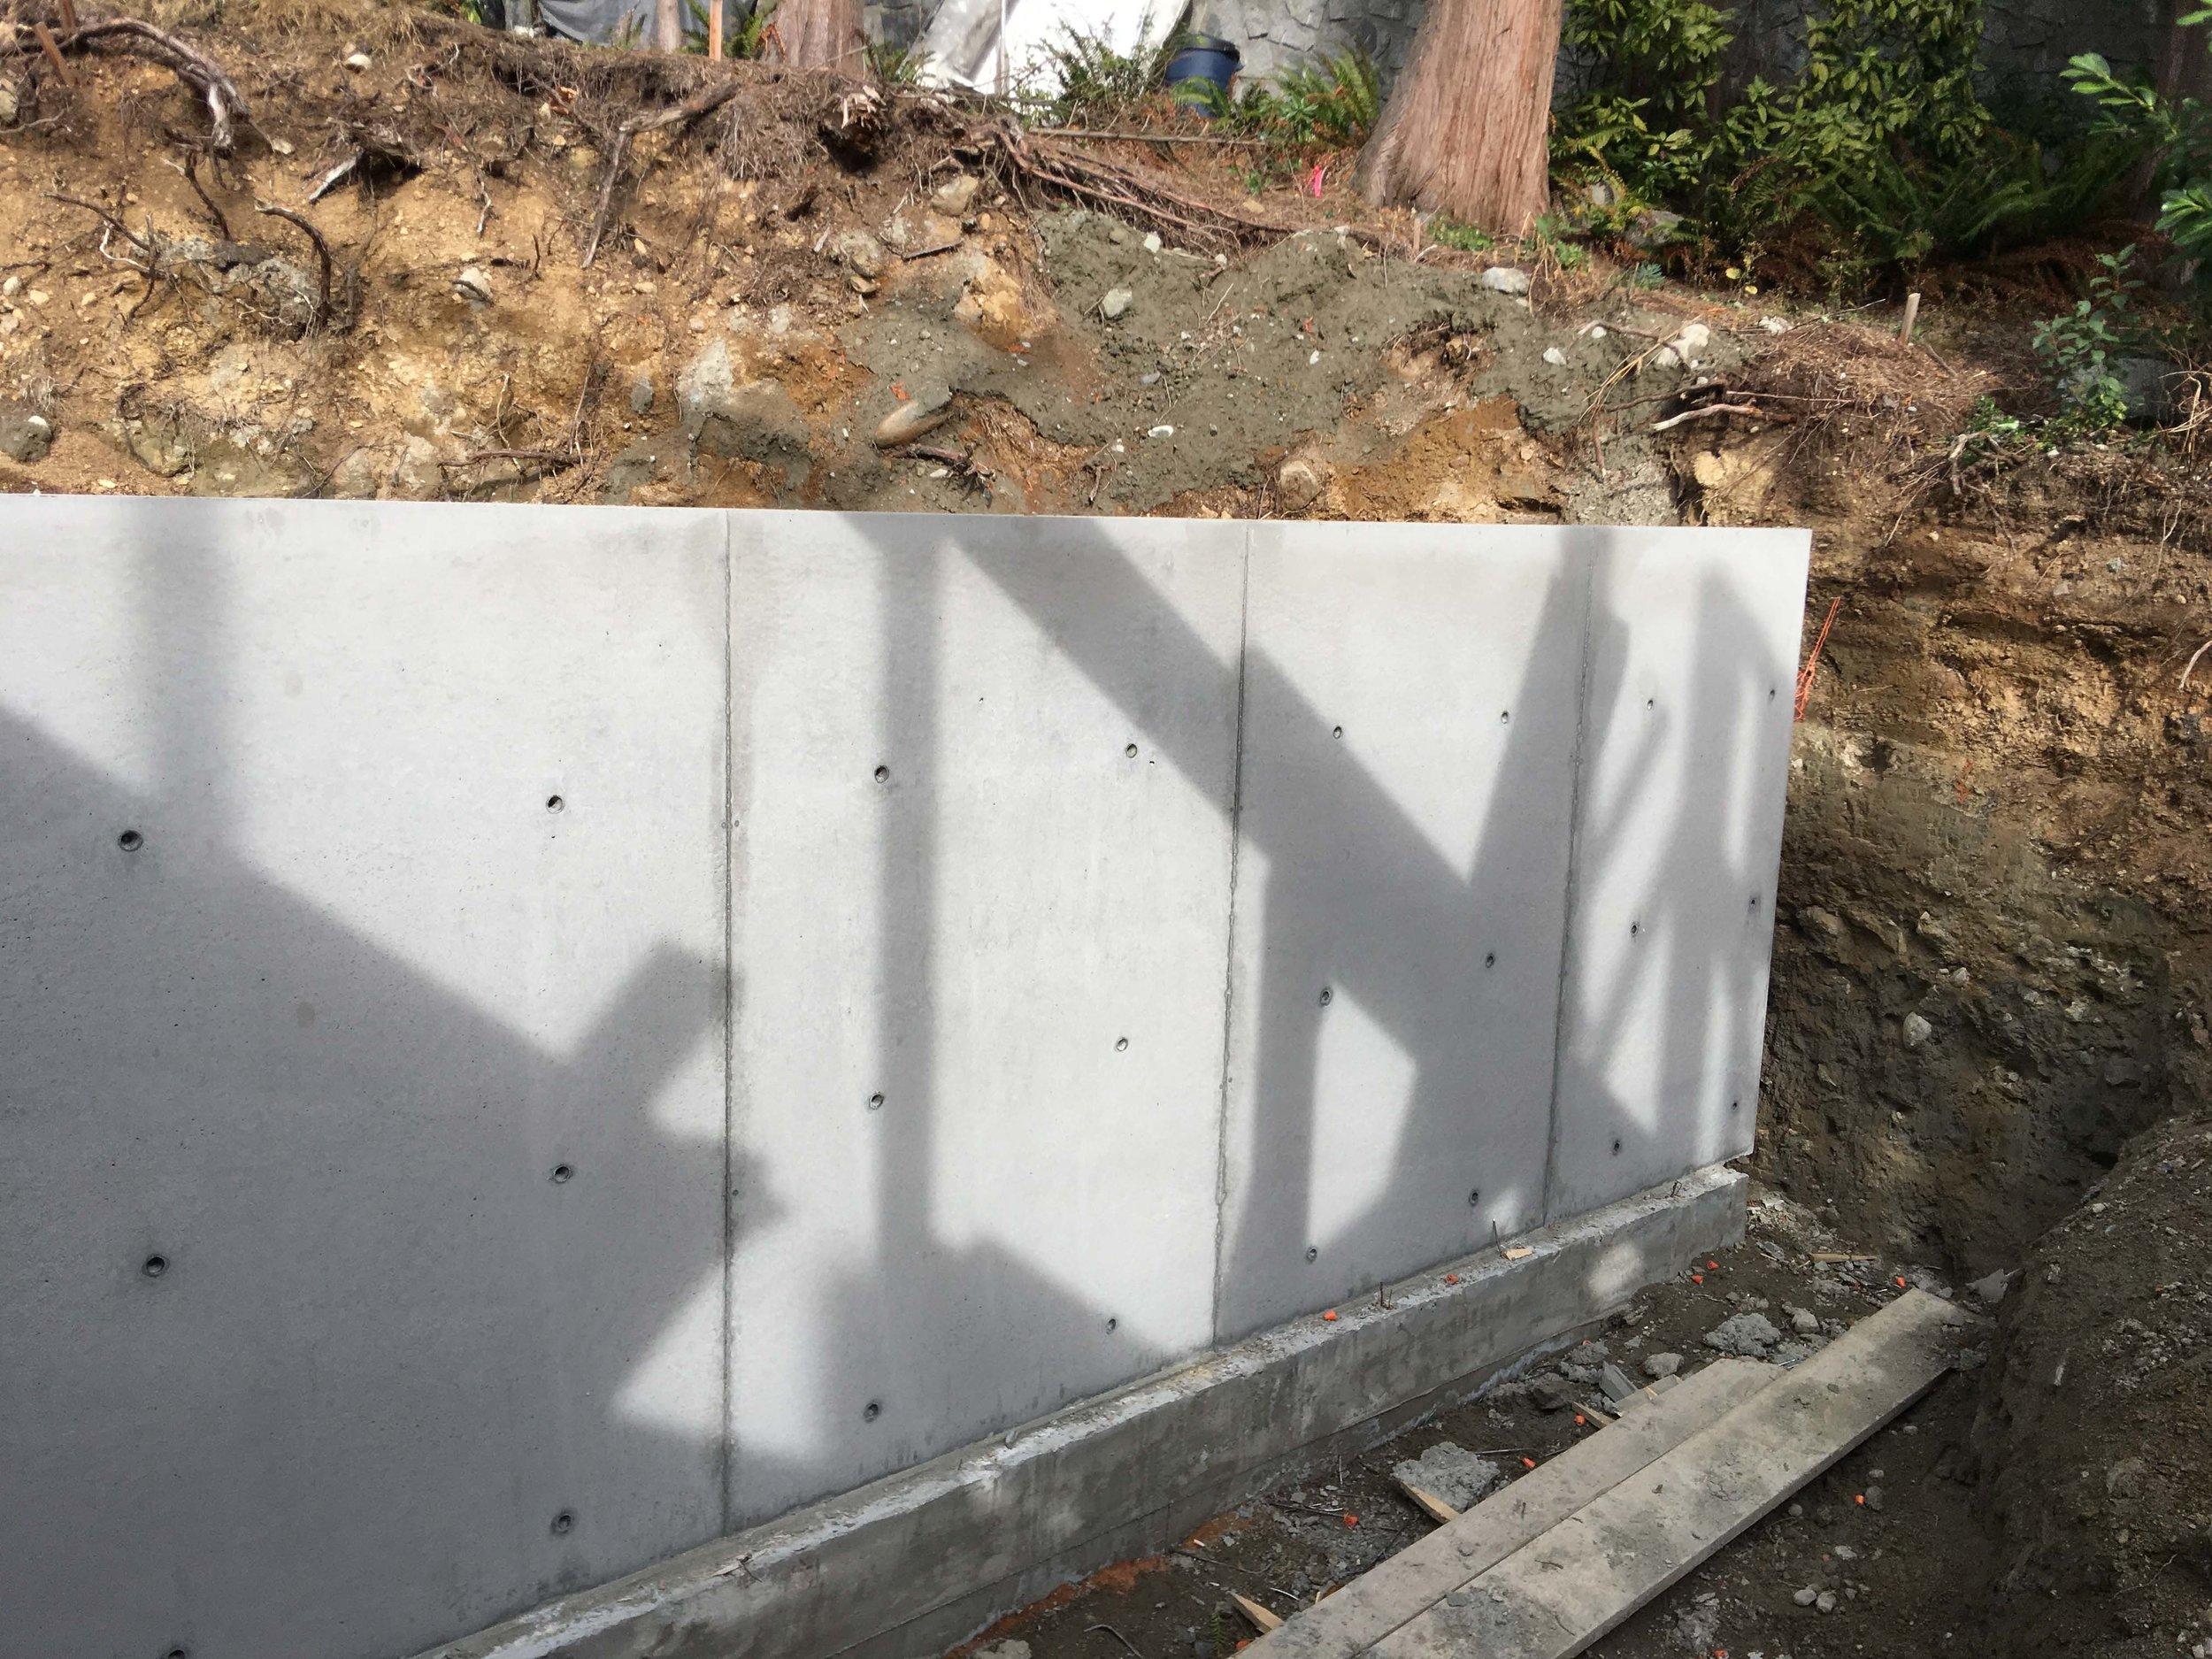 Postle_Construction_ConcreteForming33.jpg